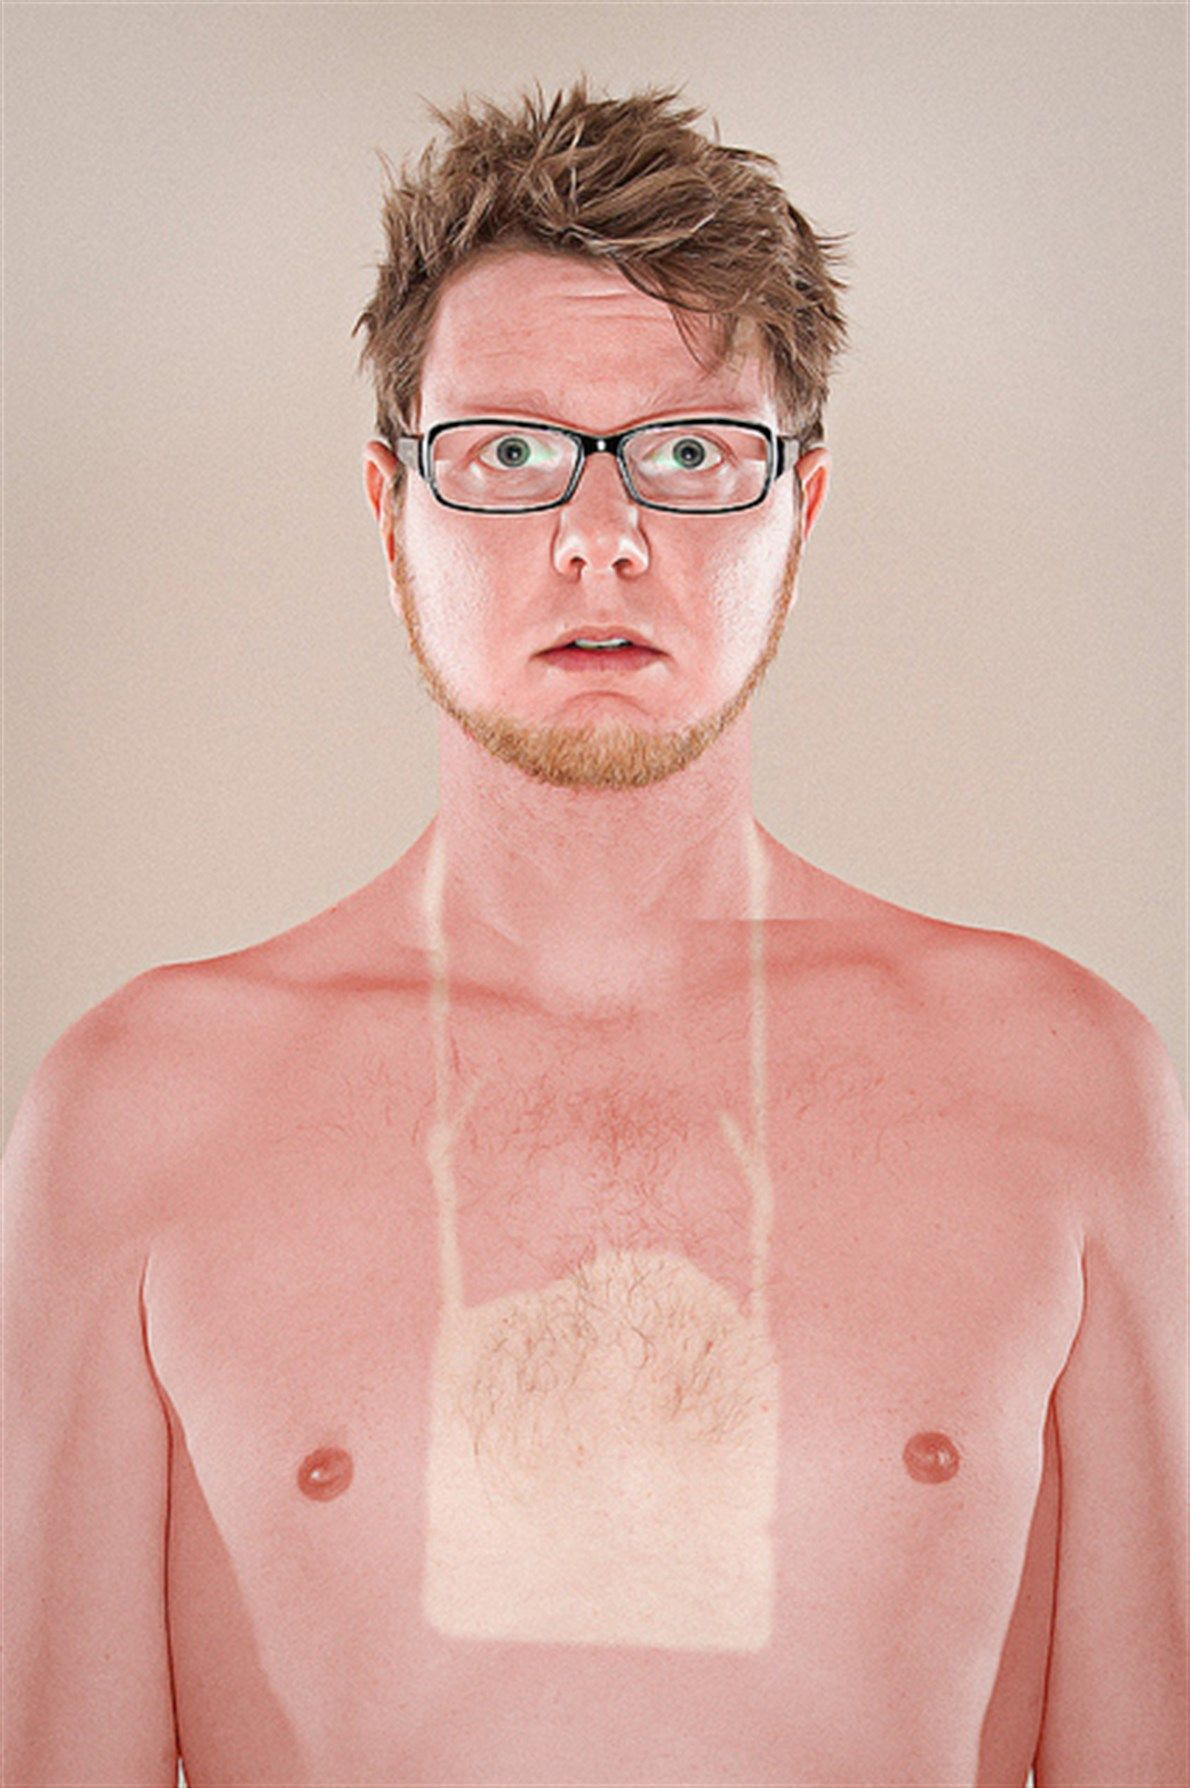 Sun tan line of a neck tag